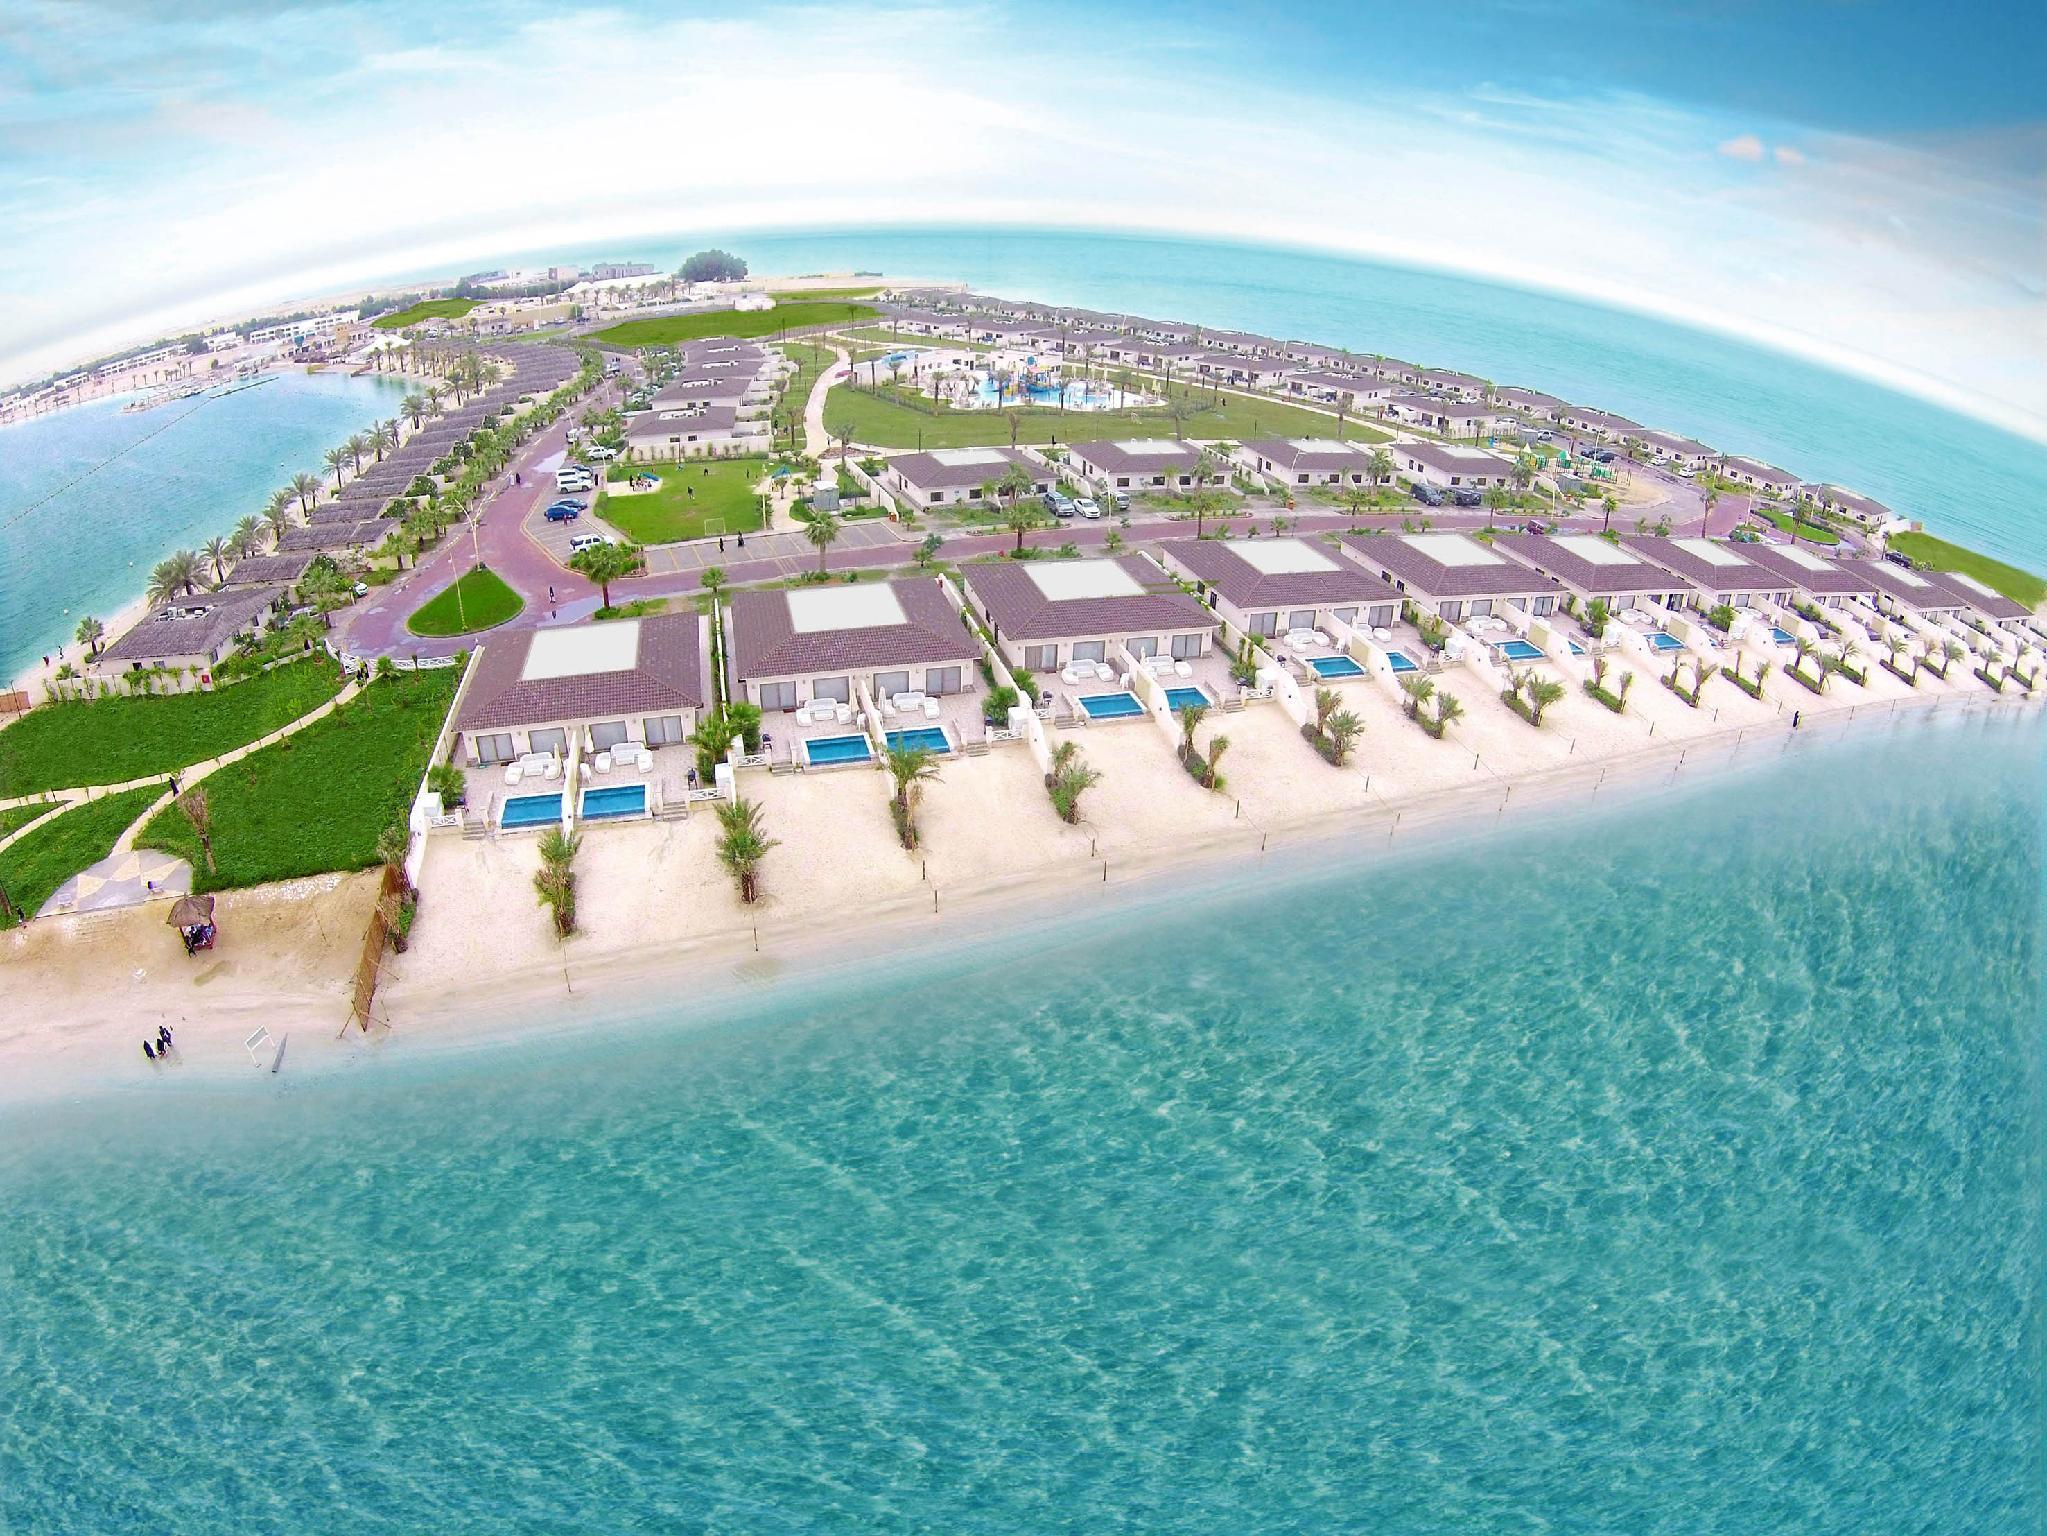 Dana Beach Resort Half Moon Bay Al Khobar Families Only